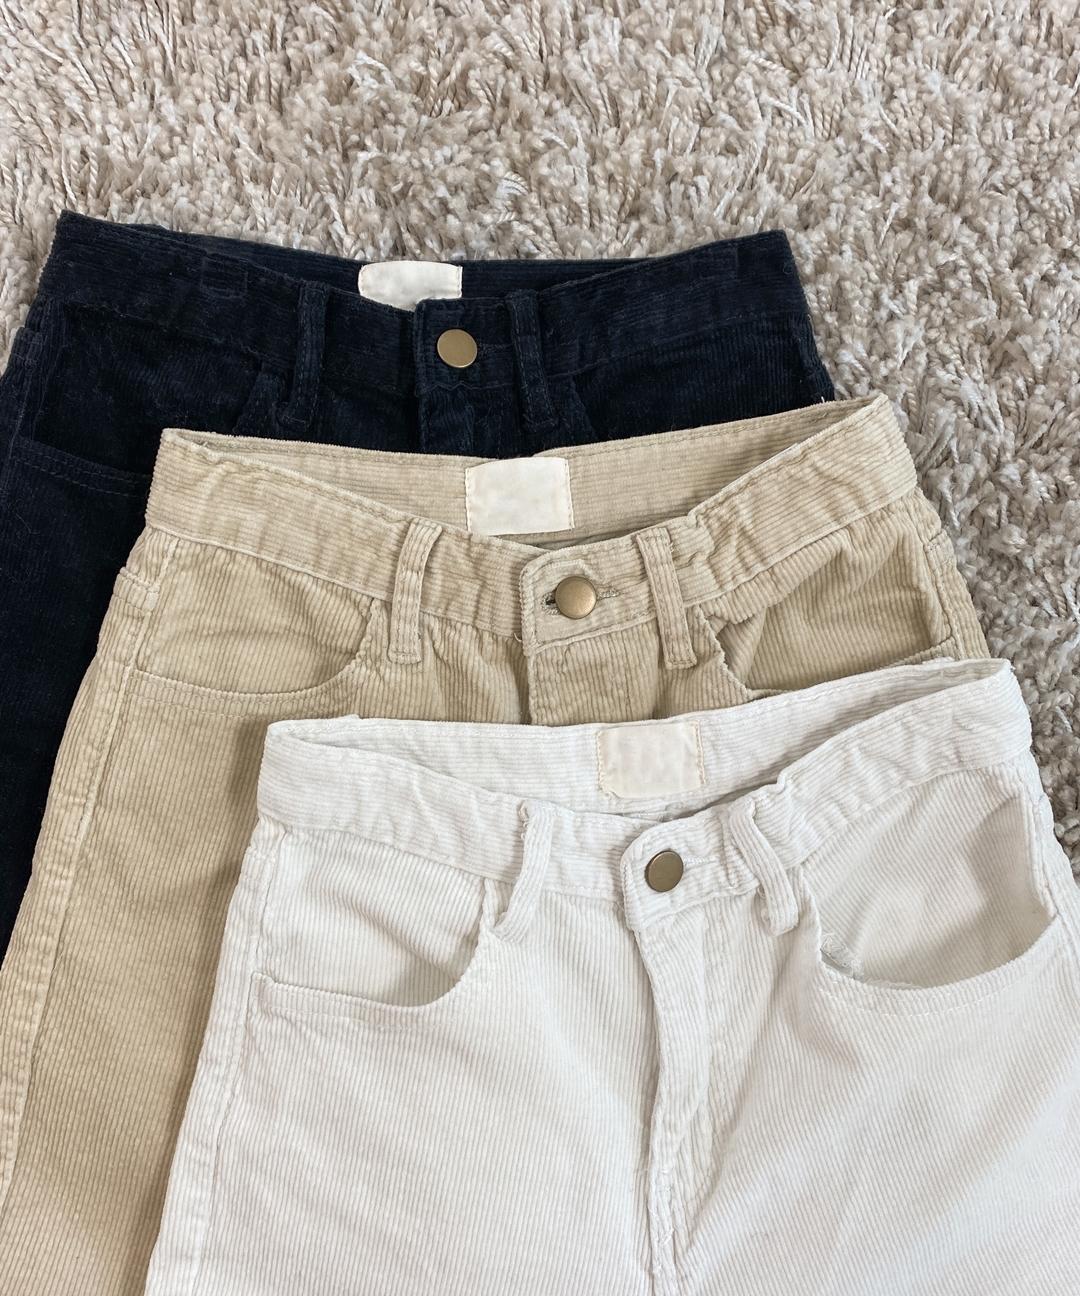 Straight Cut Corduroy Pants